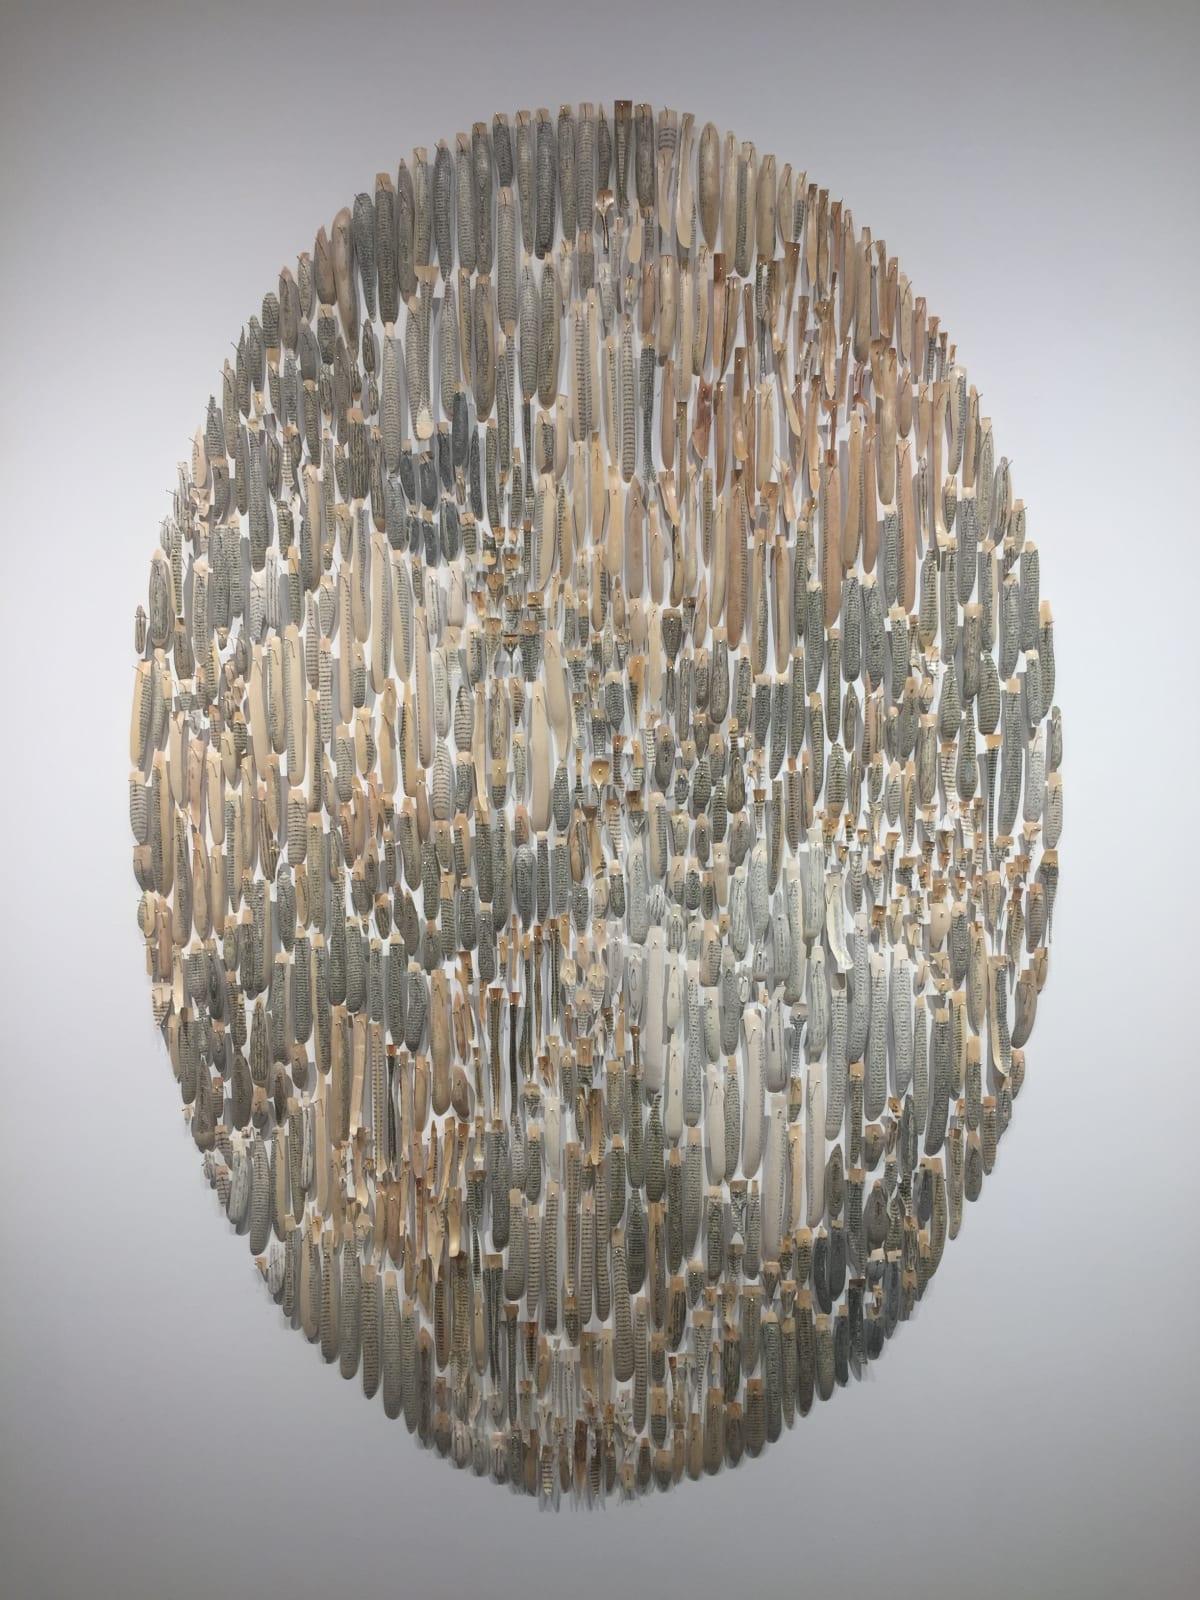 Jessica Drenk, Bibliophylum, 2017